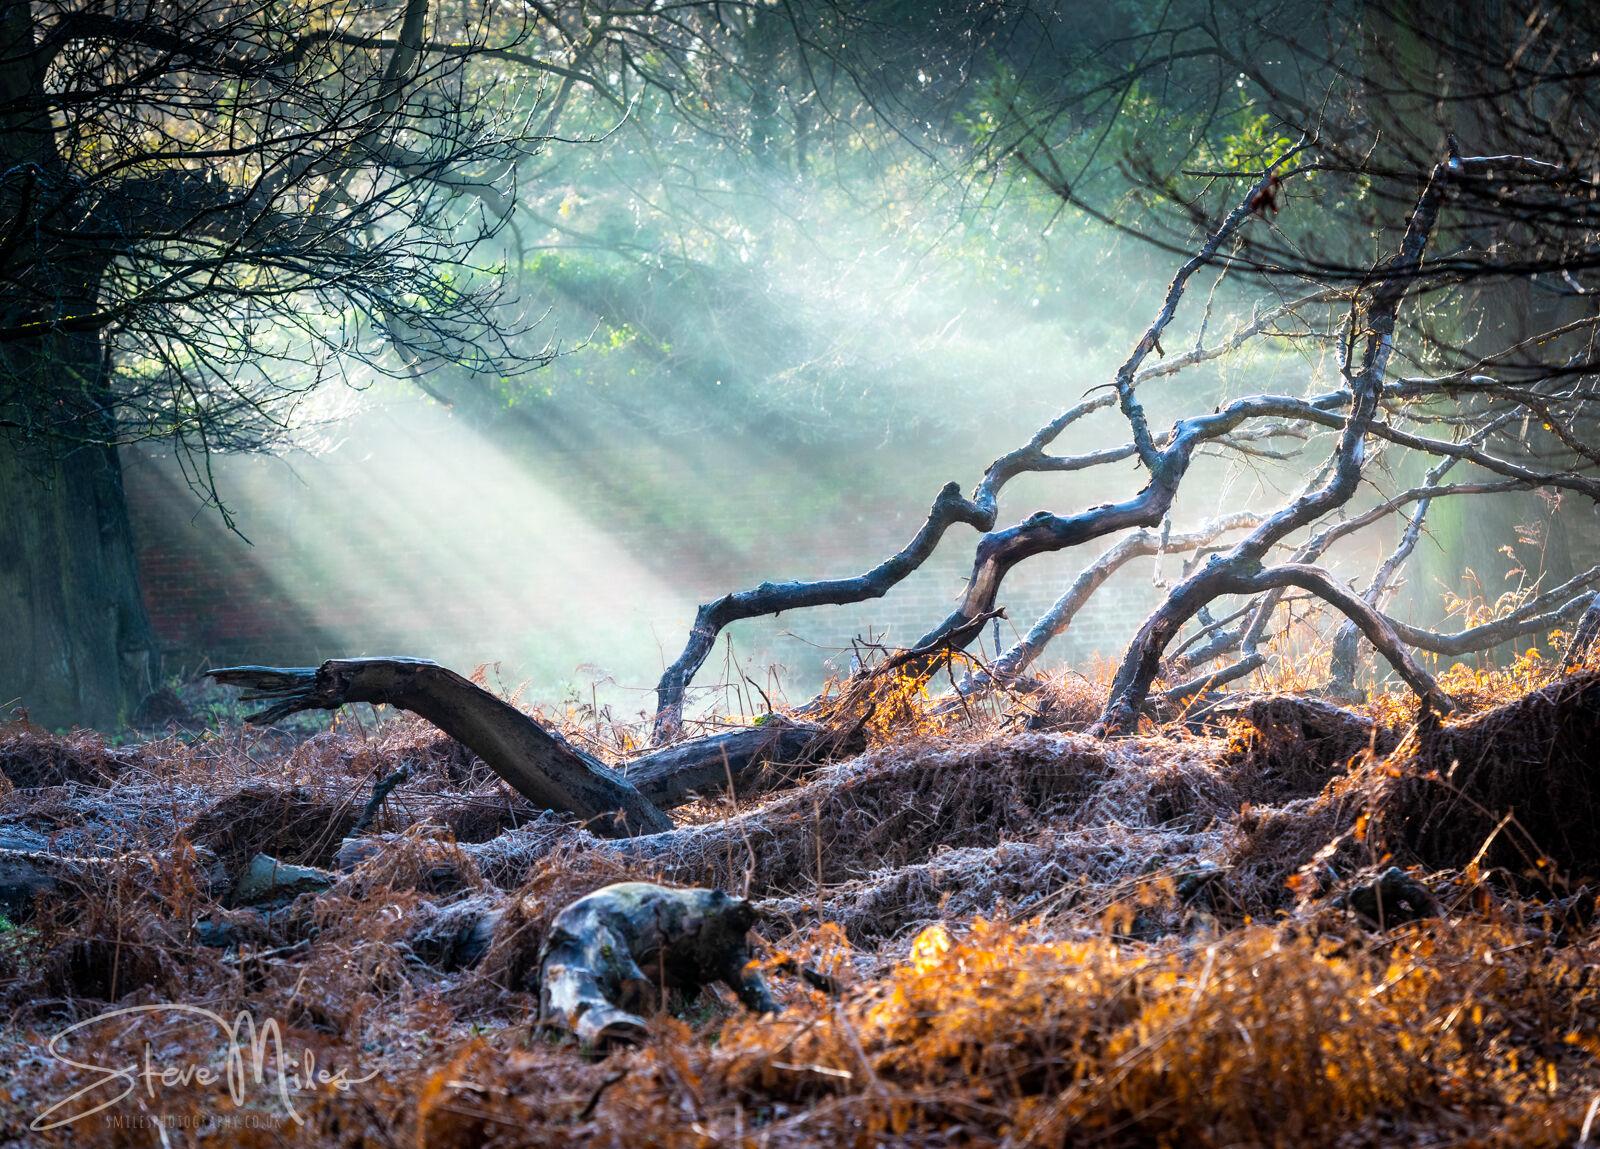 Morning sun burns frost away